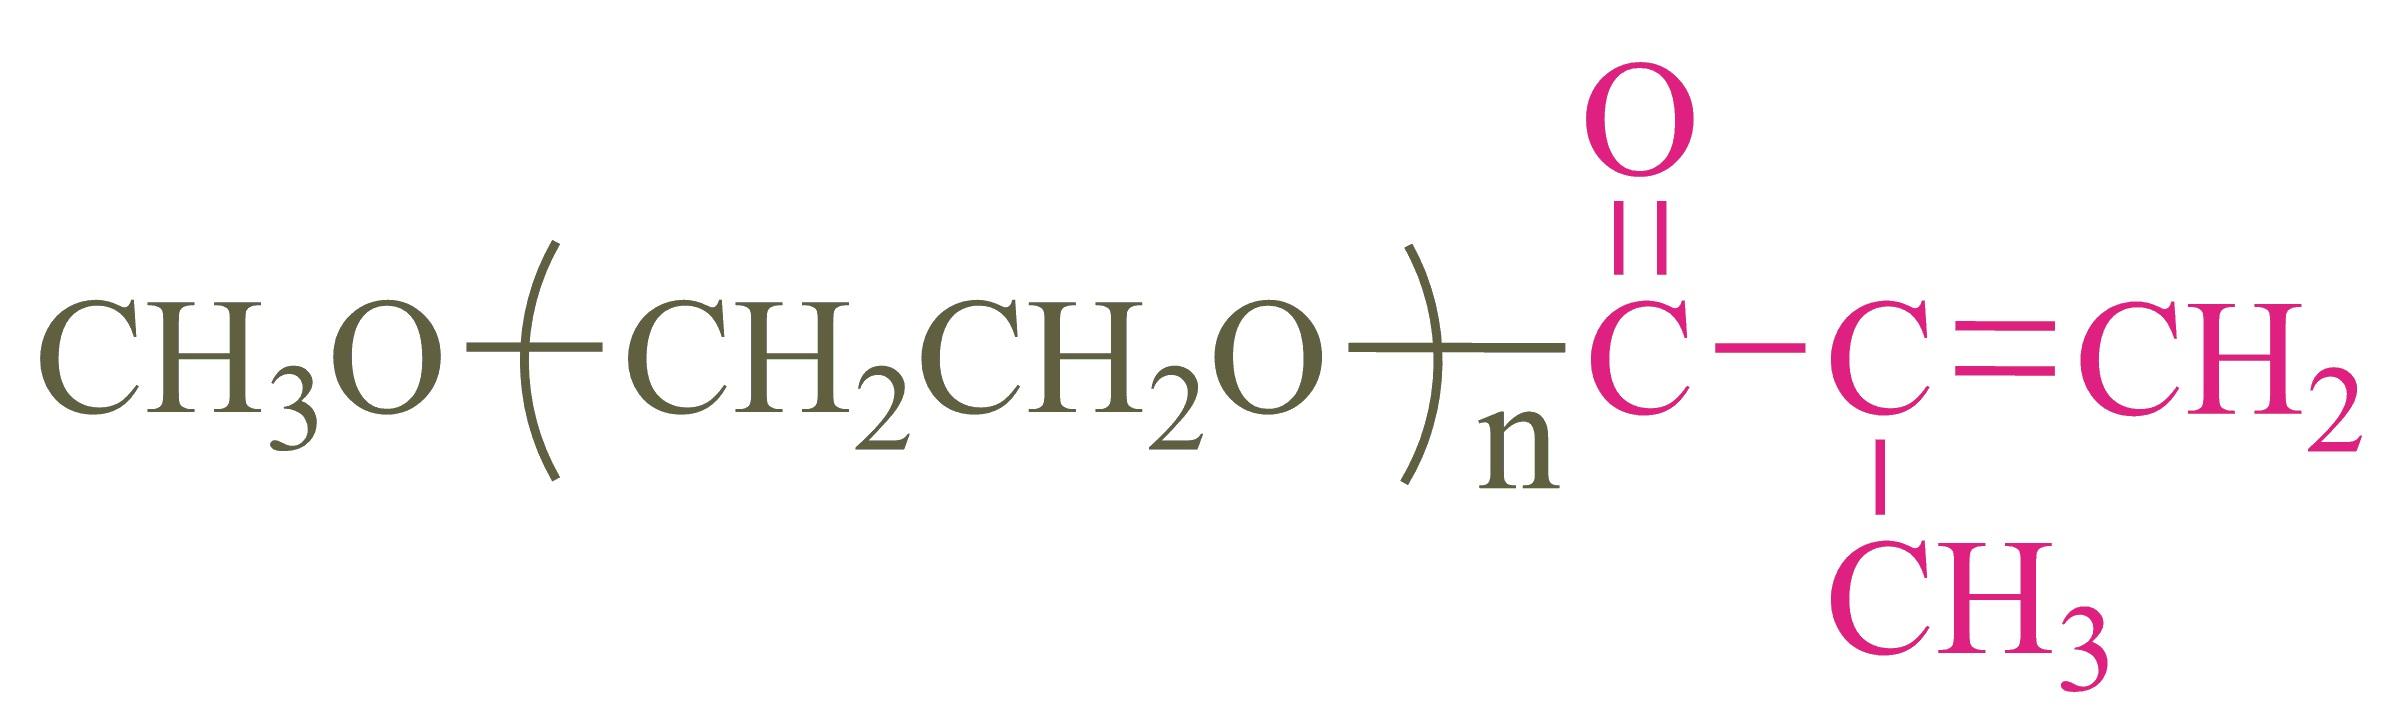 甲氧基聚乙二醇甲基丙烯酸酯;Methoxypoly(ethylene glycol) methacrylate;(mPEG-MA)